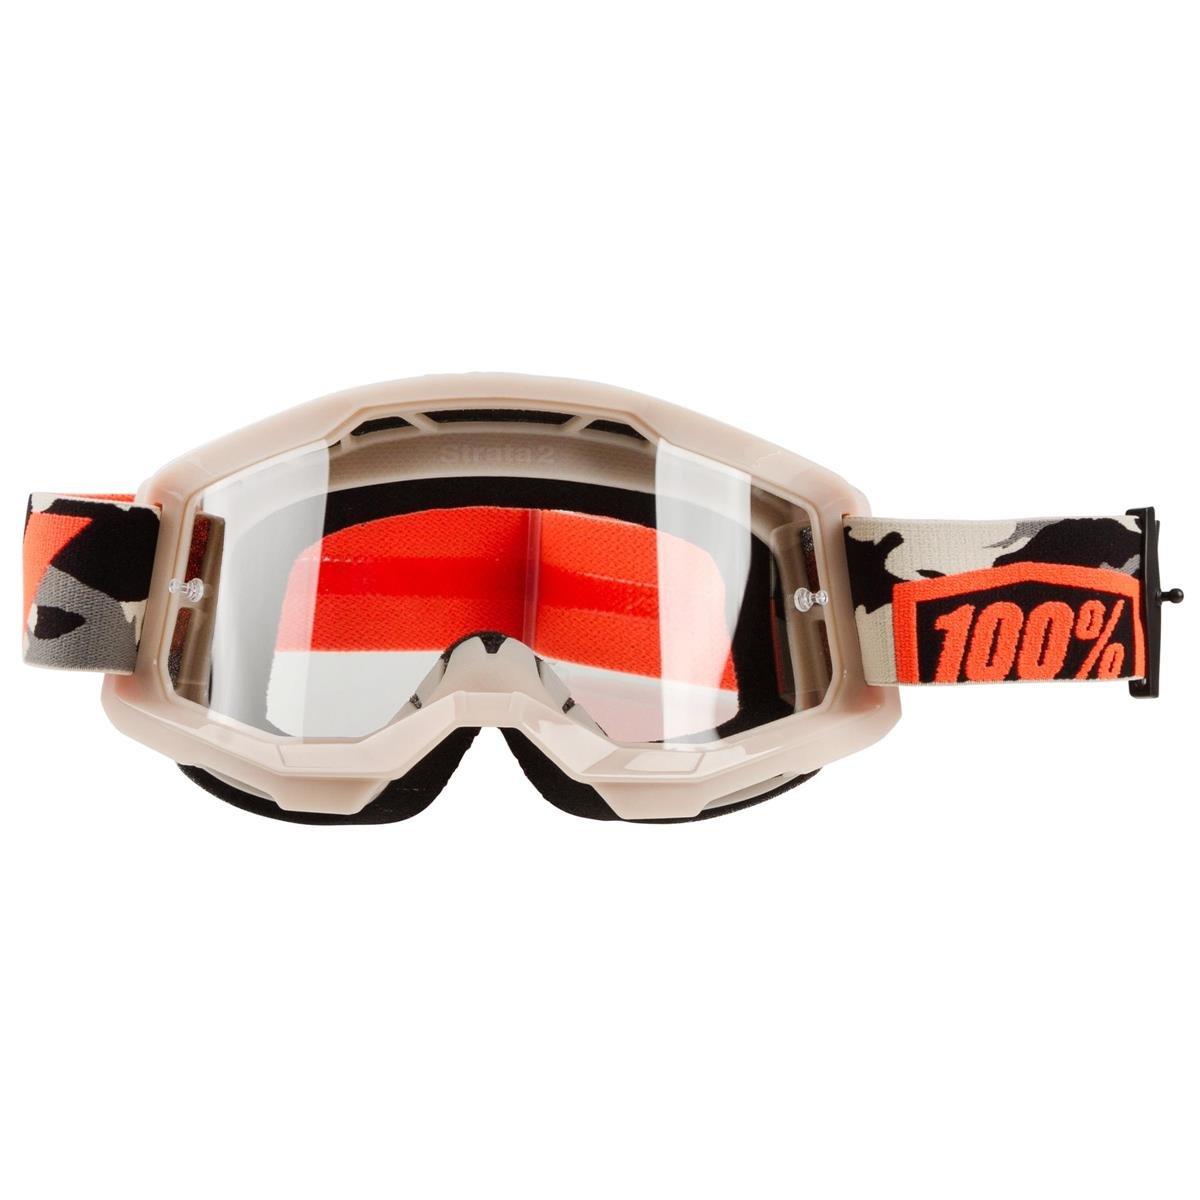 Oculos-para-Ciclismo-100--Strata-2-Goggle-Kombat-UV400---10172--1-